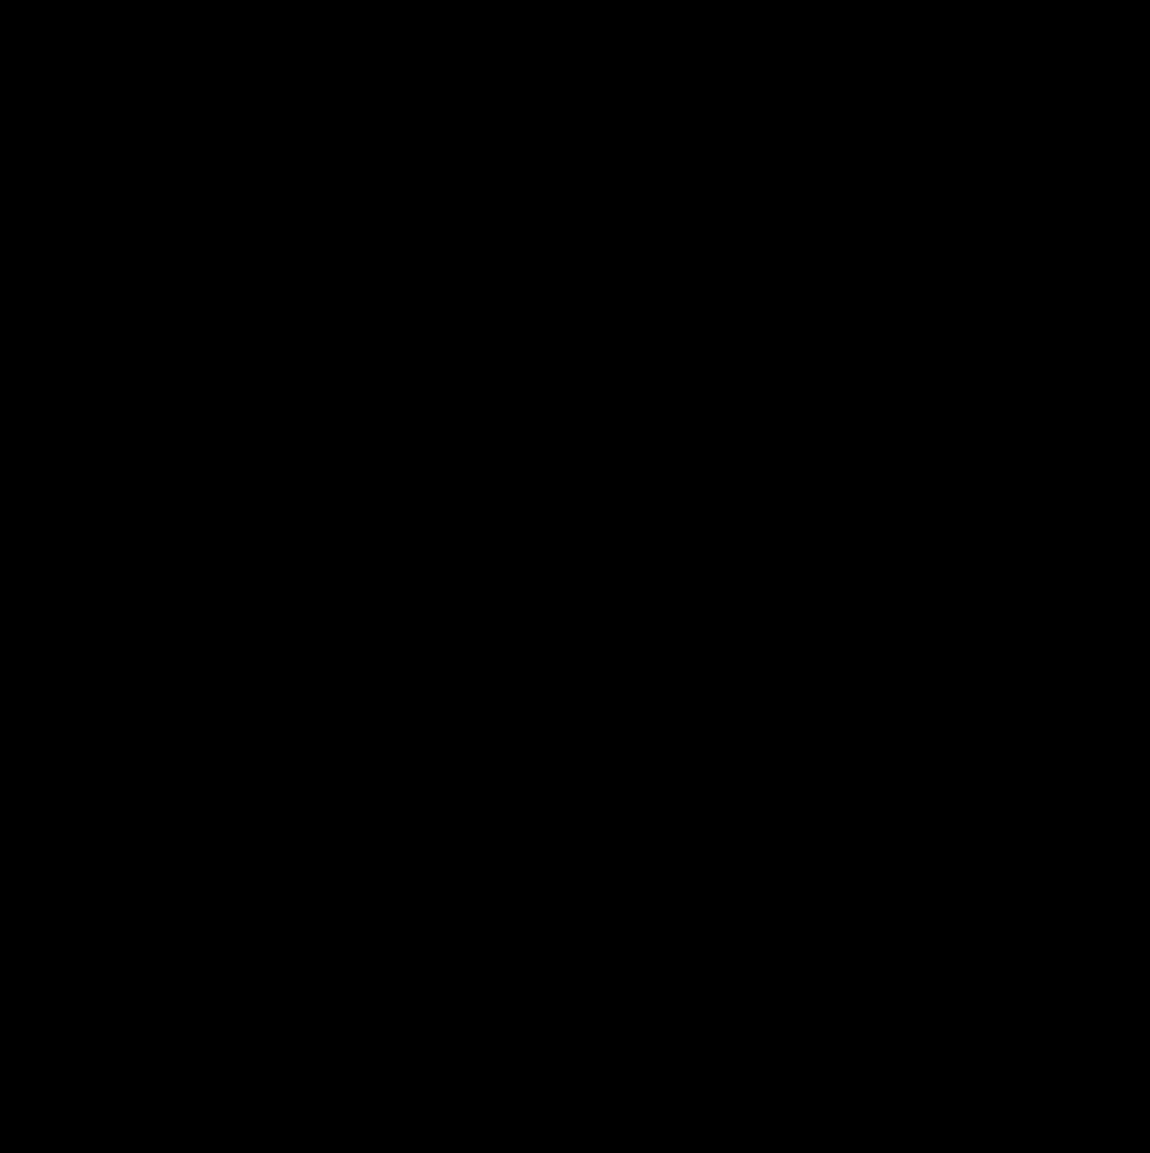 printable monogram letter template